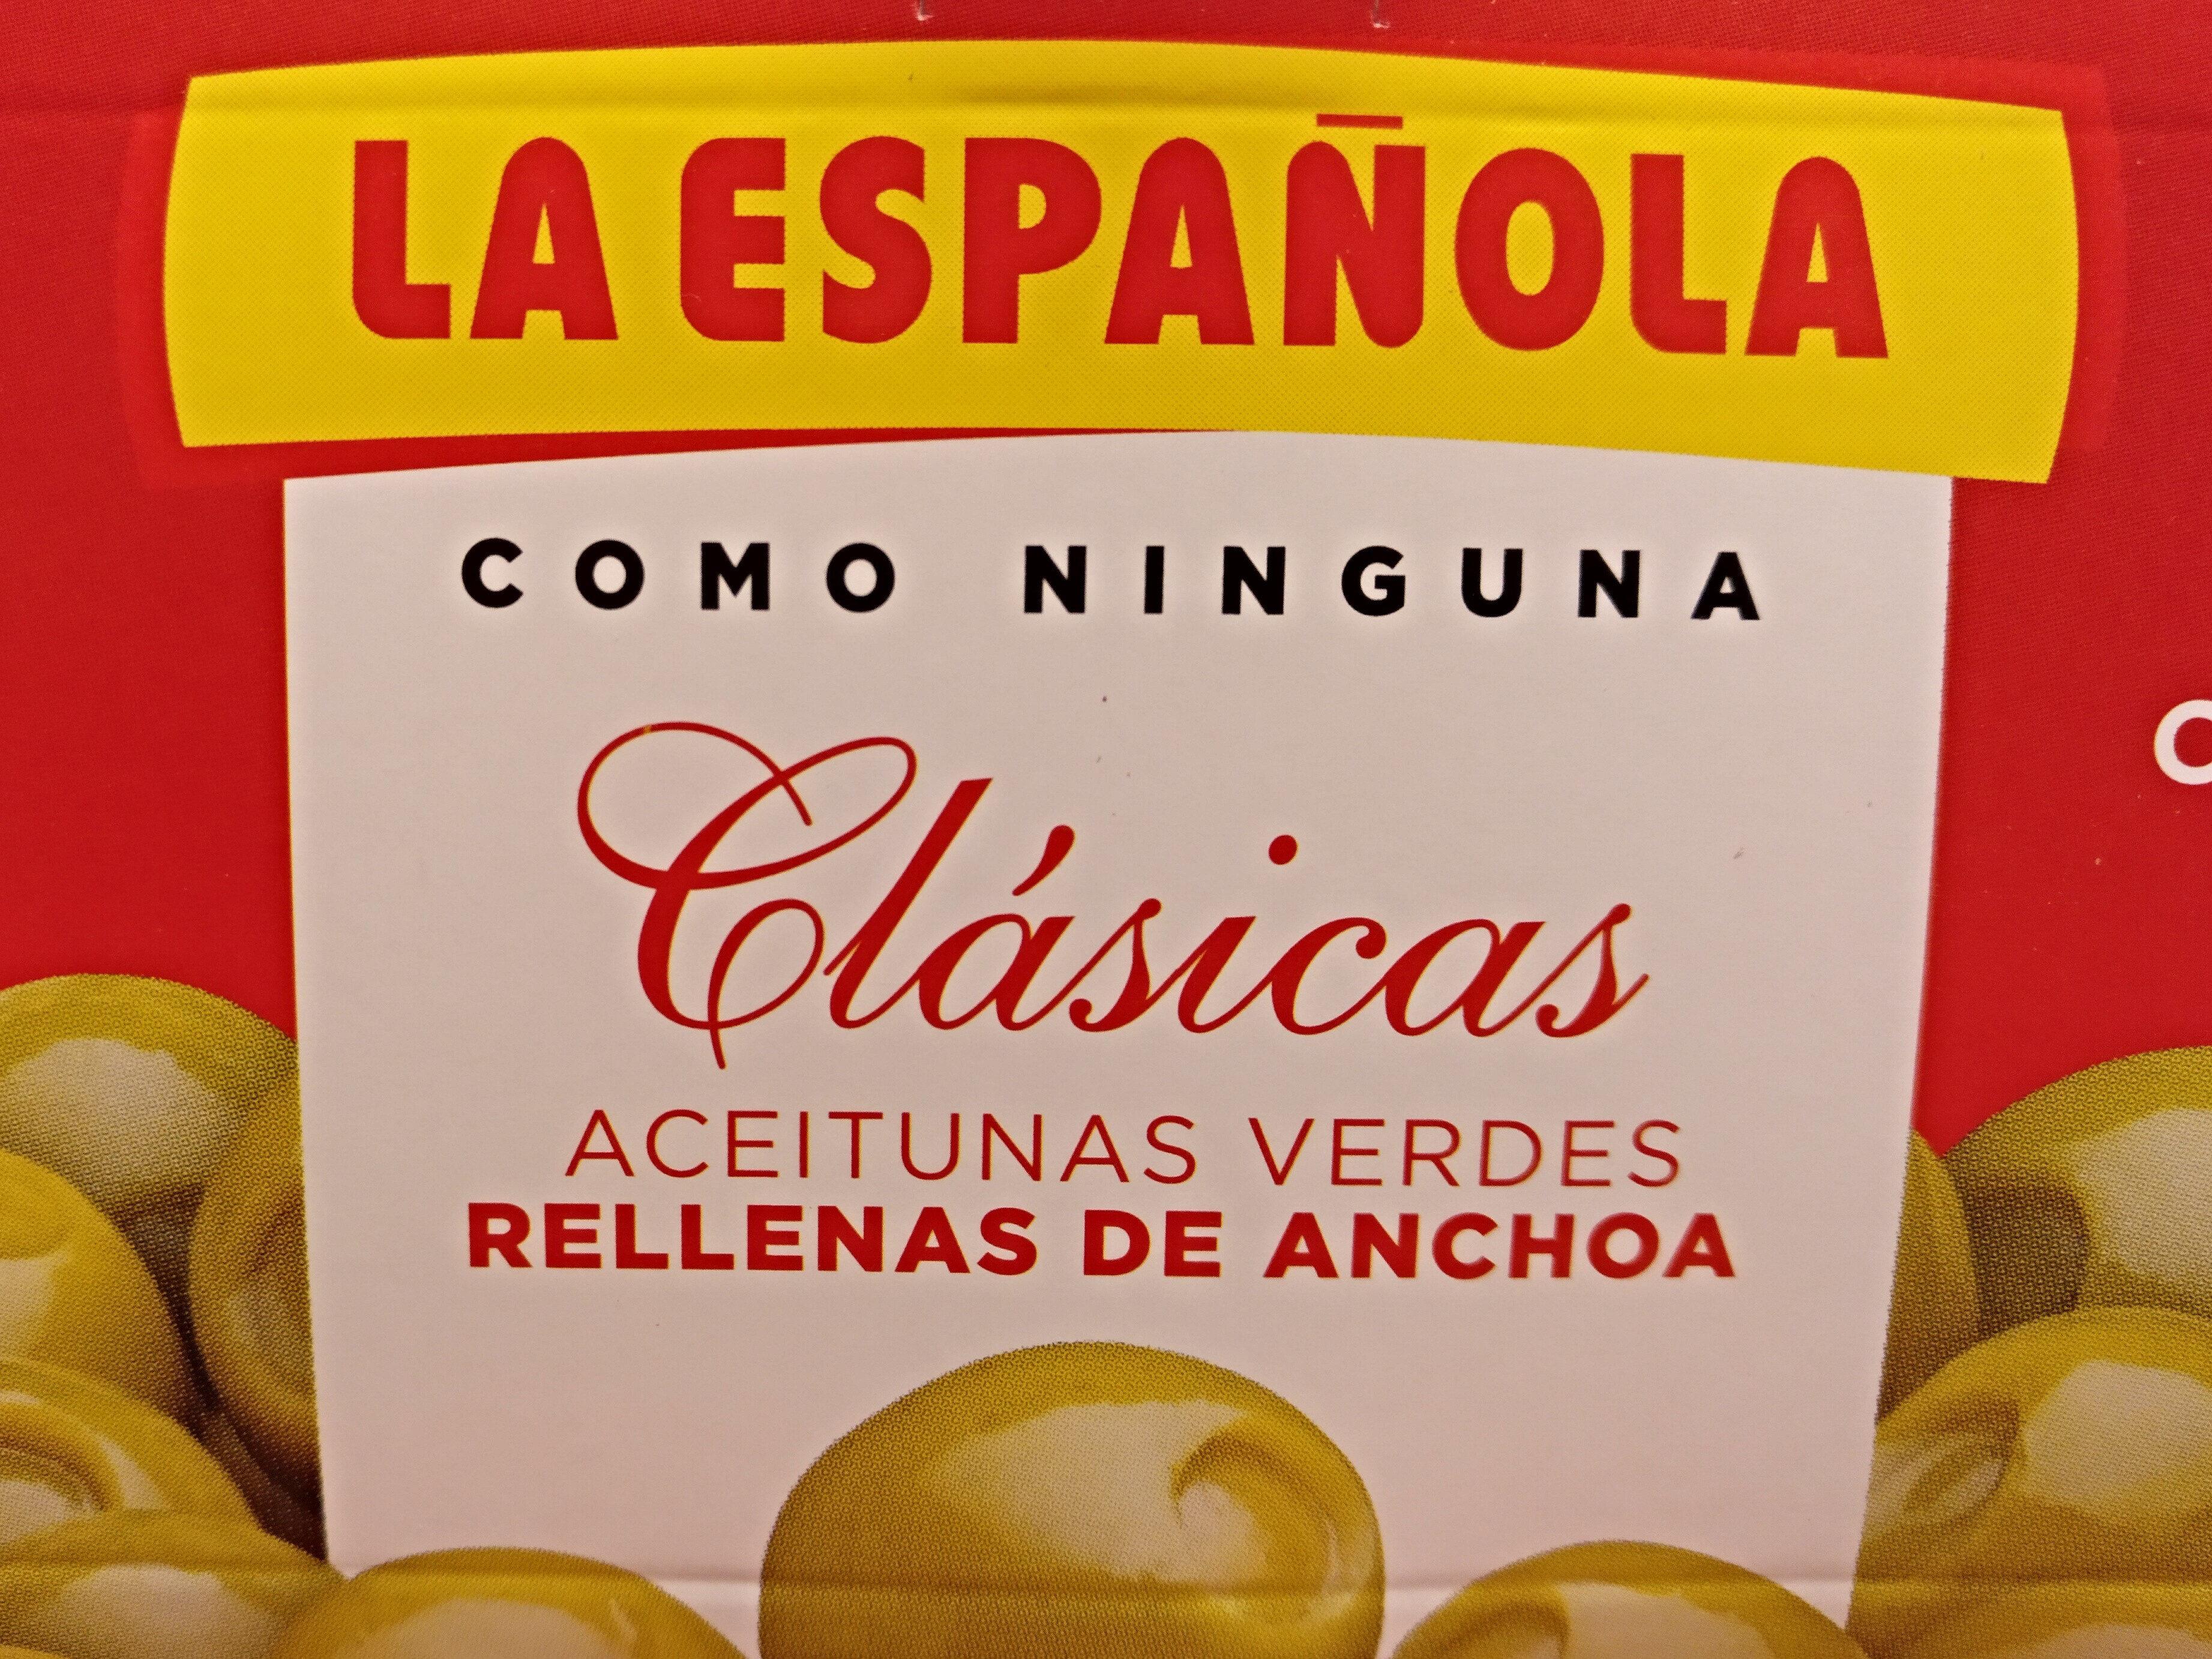 Aceitunas rellenas de anchoa latas - Product - es